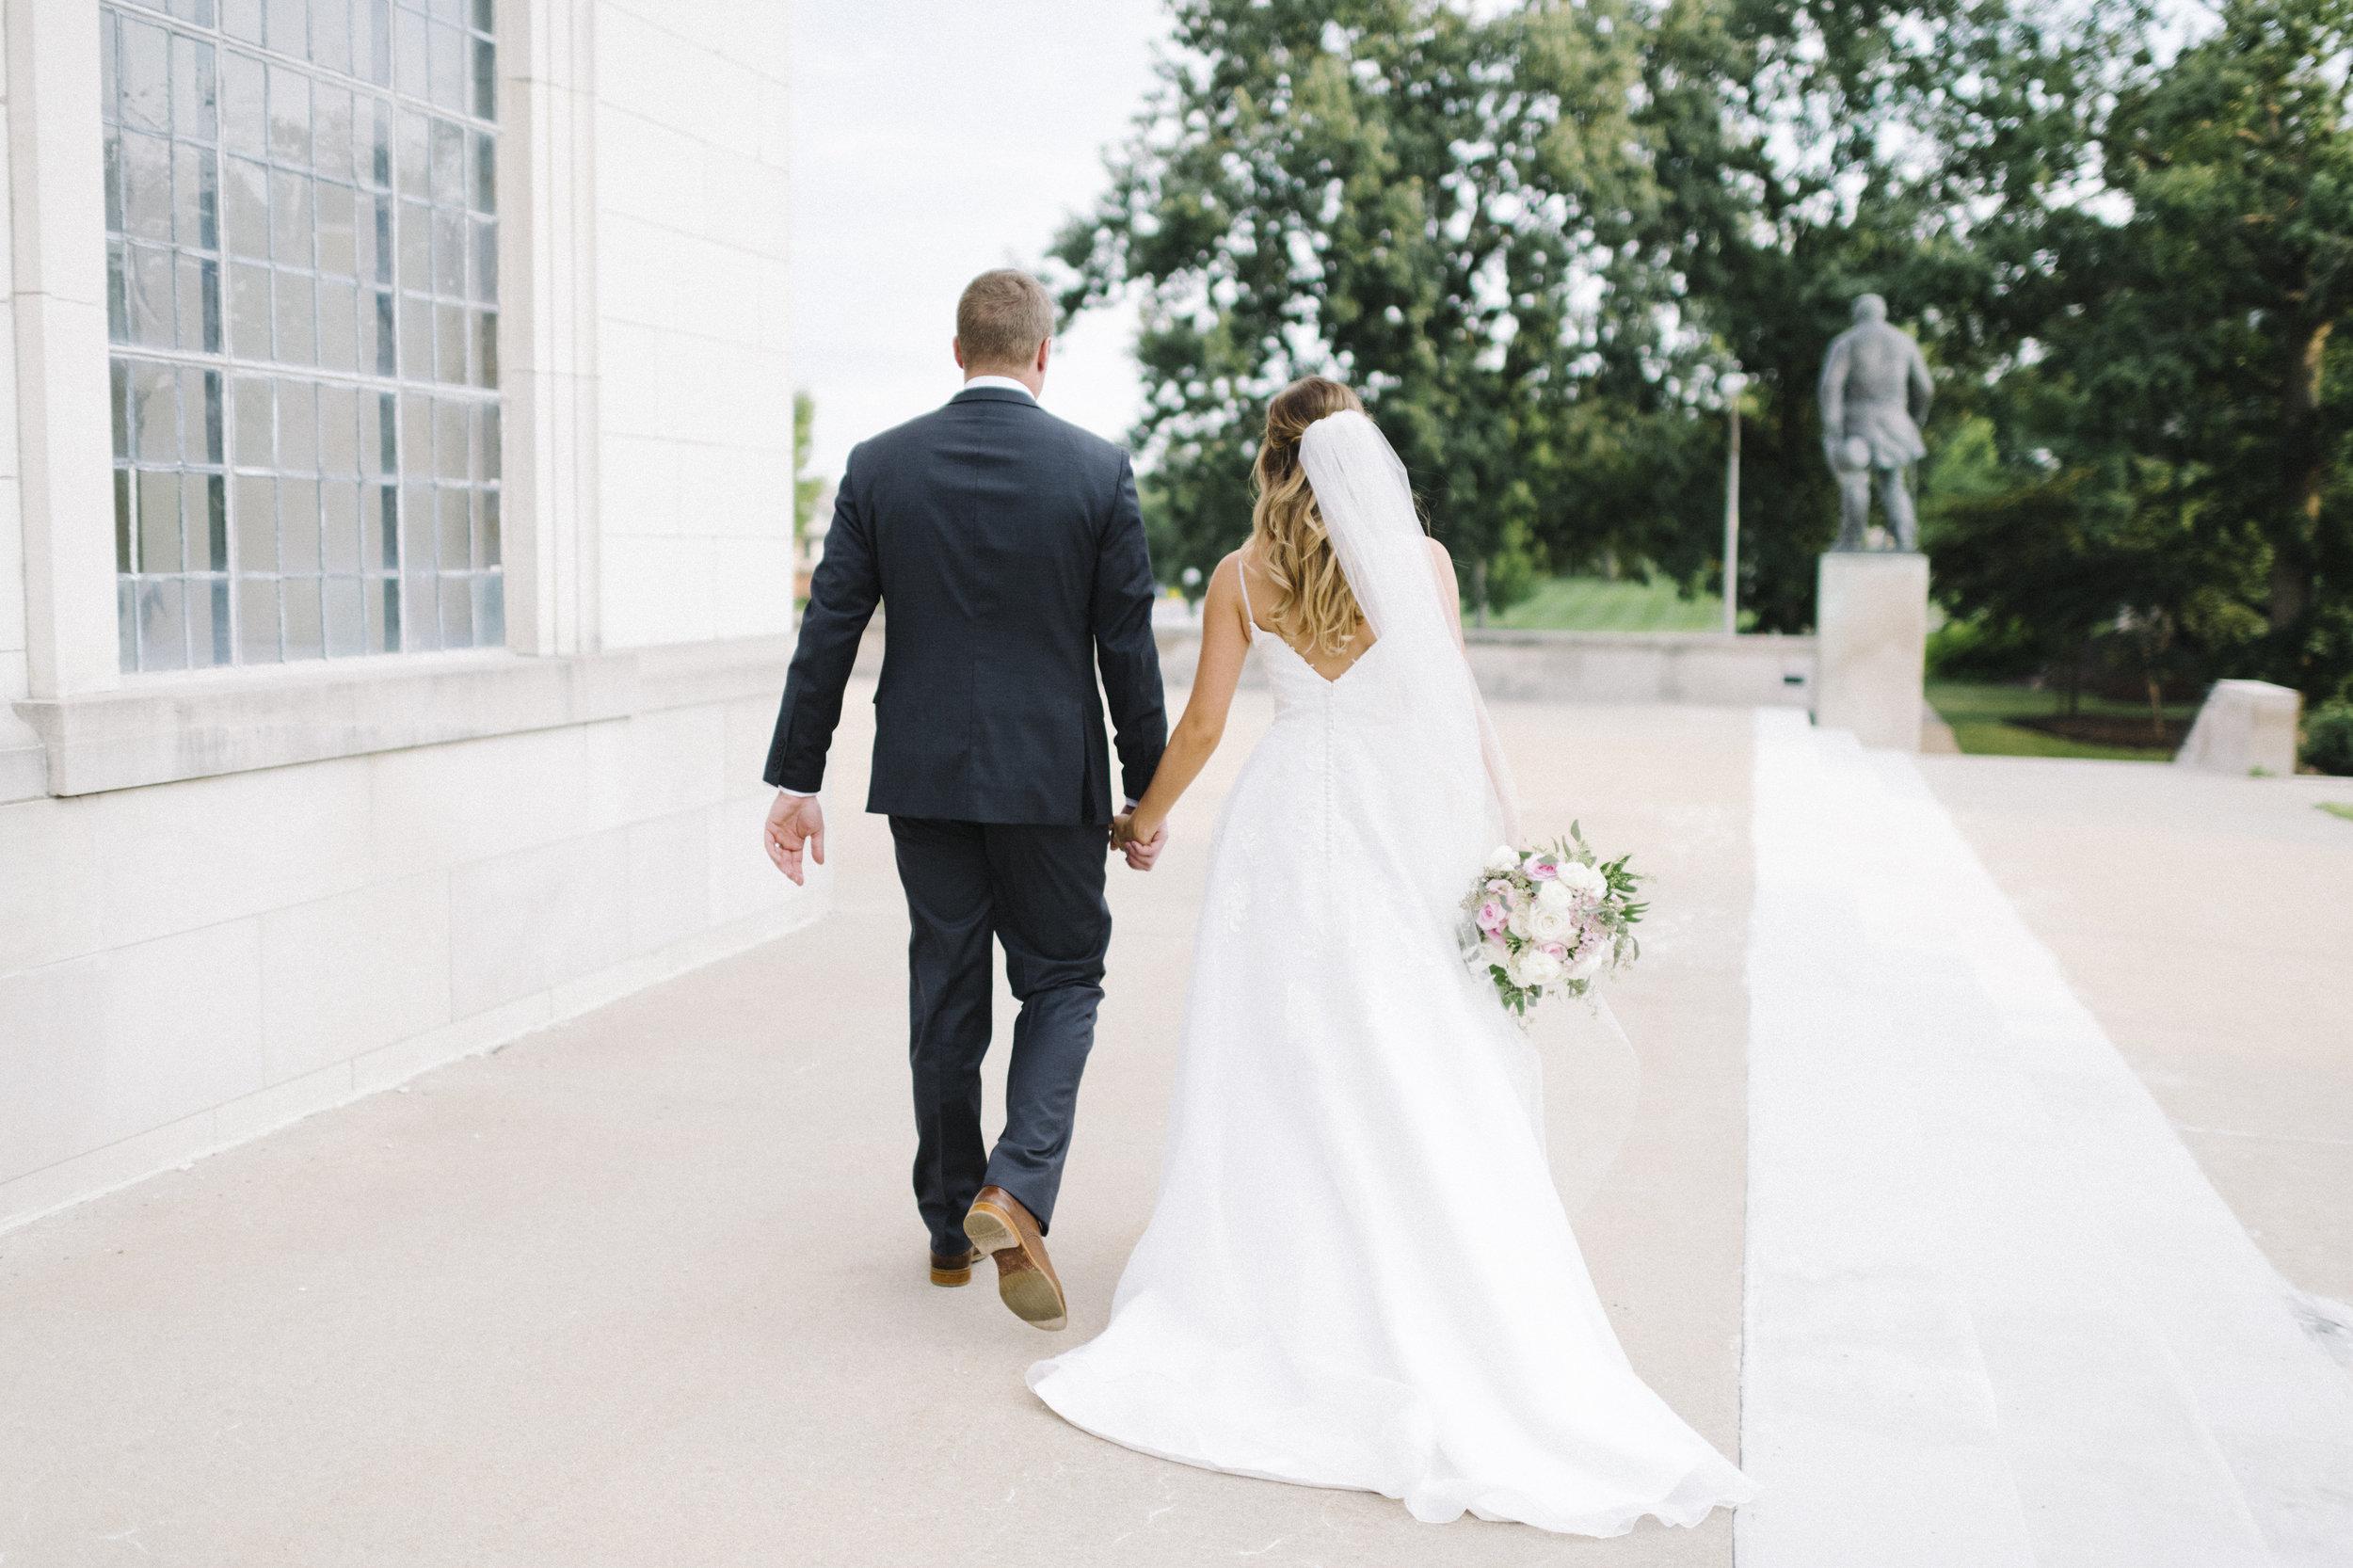 KansasCity_WeddingDress56